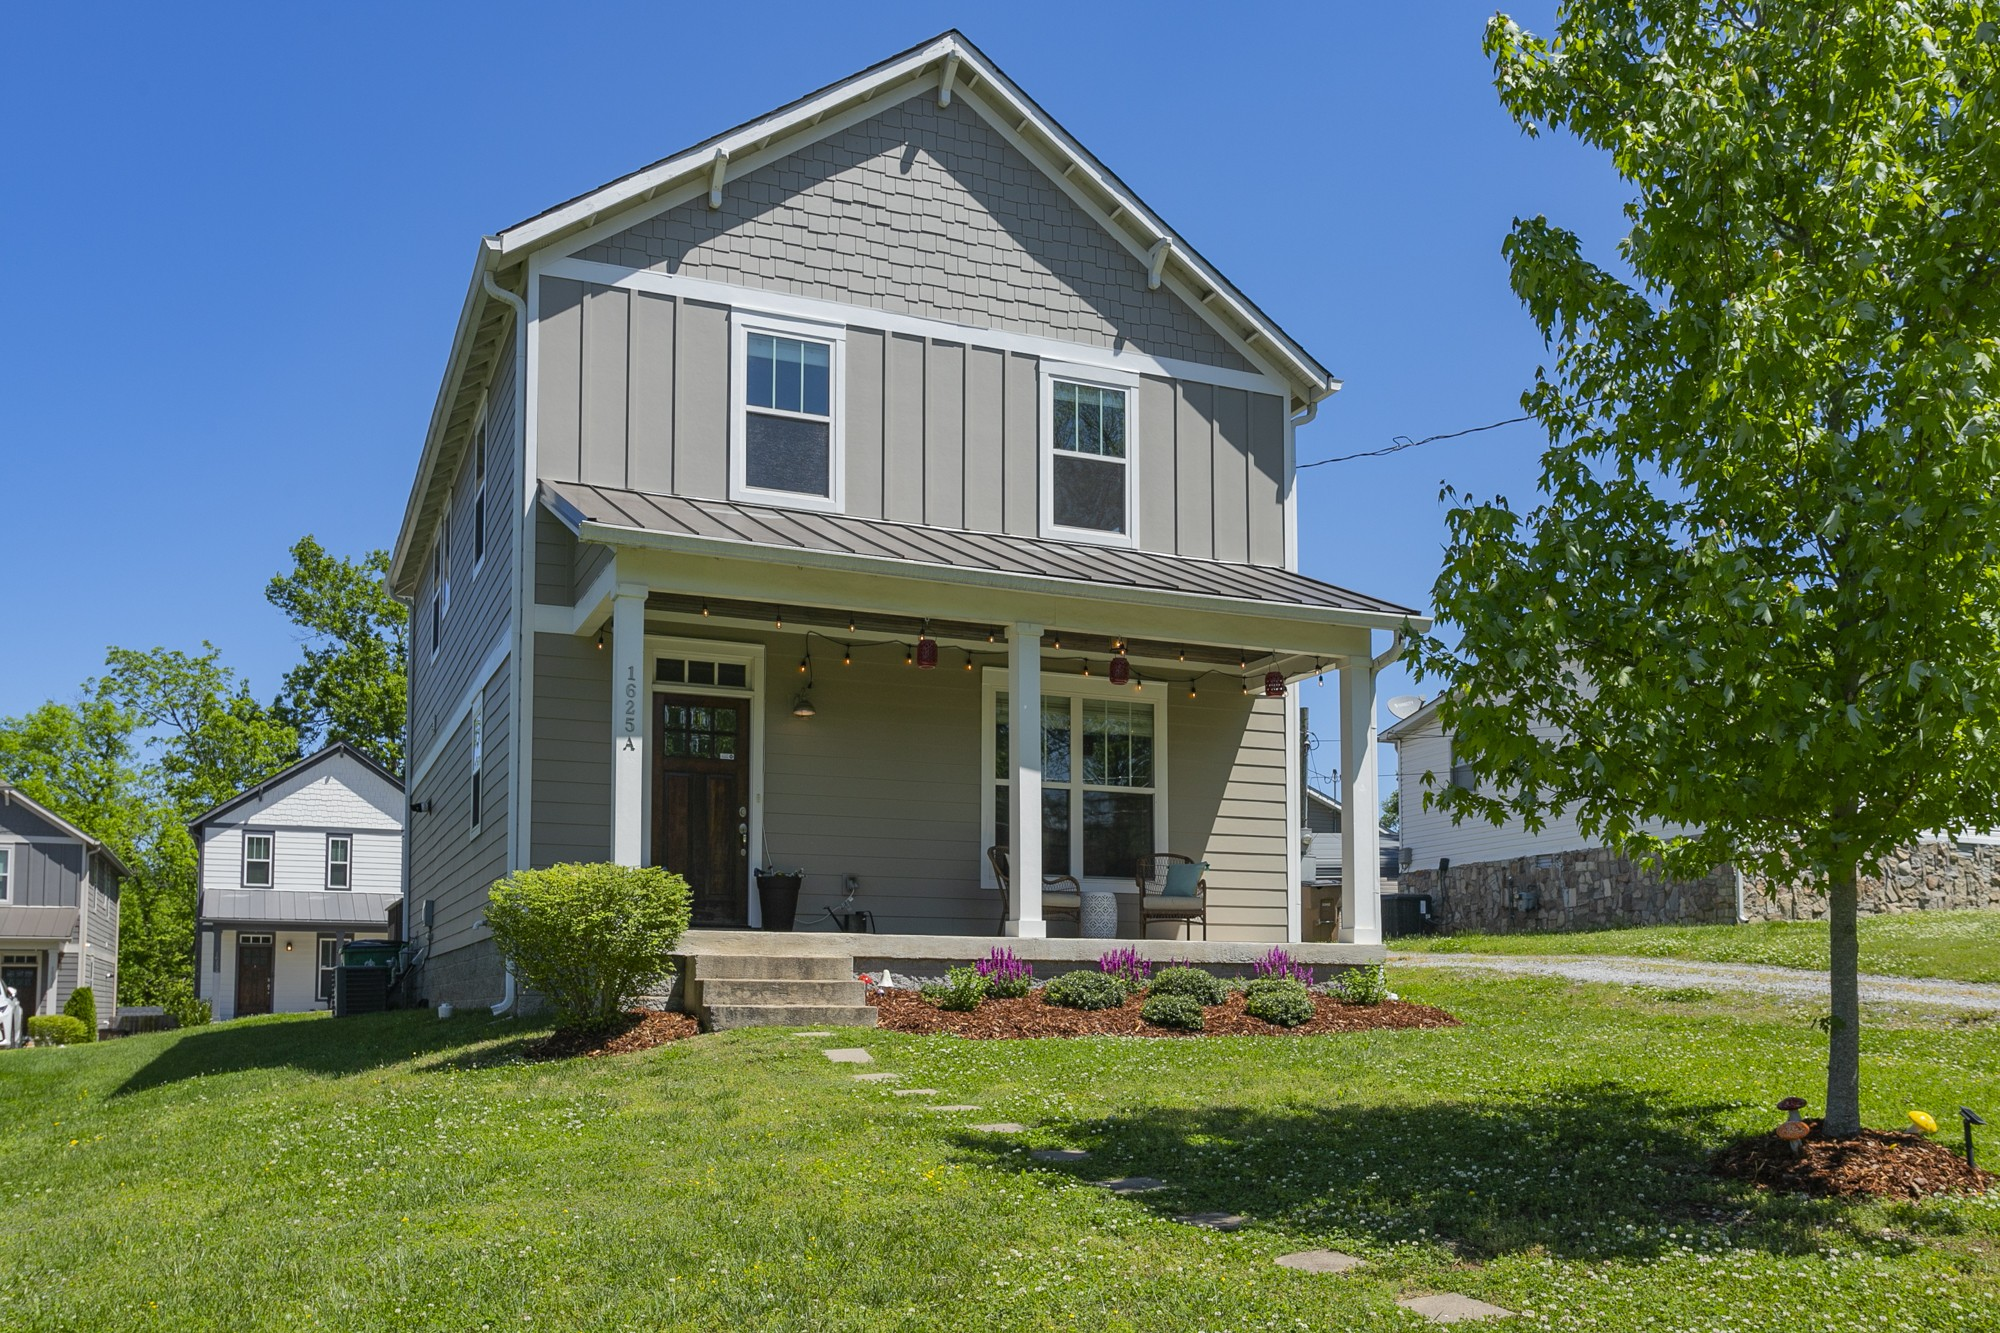 1625A Cahal Ave Property Photo - Nashville, TN real estate listing